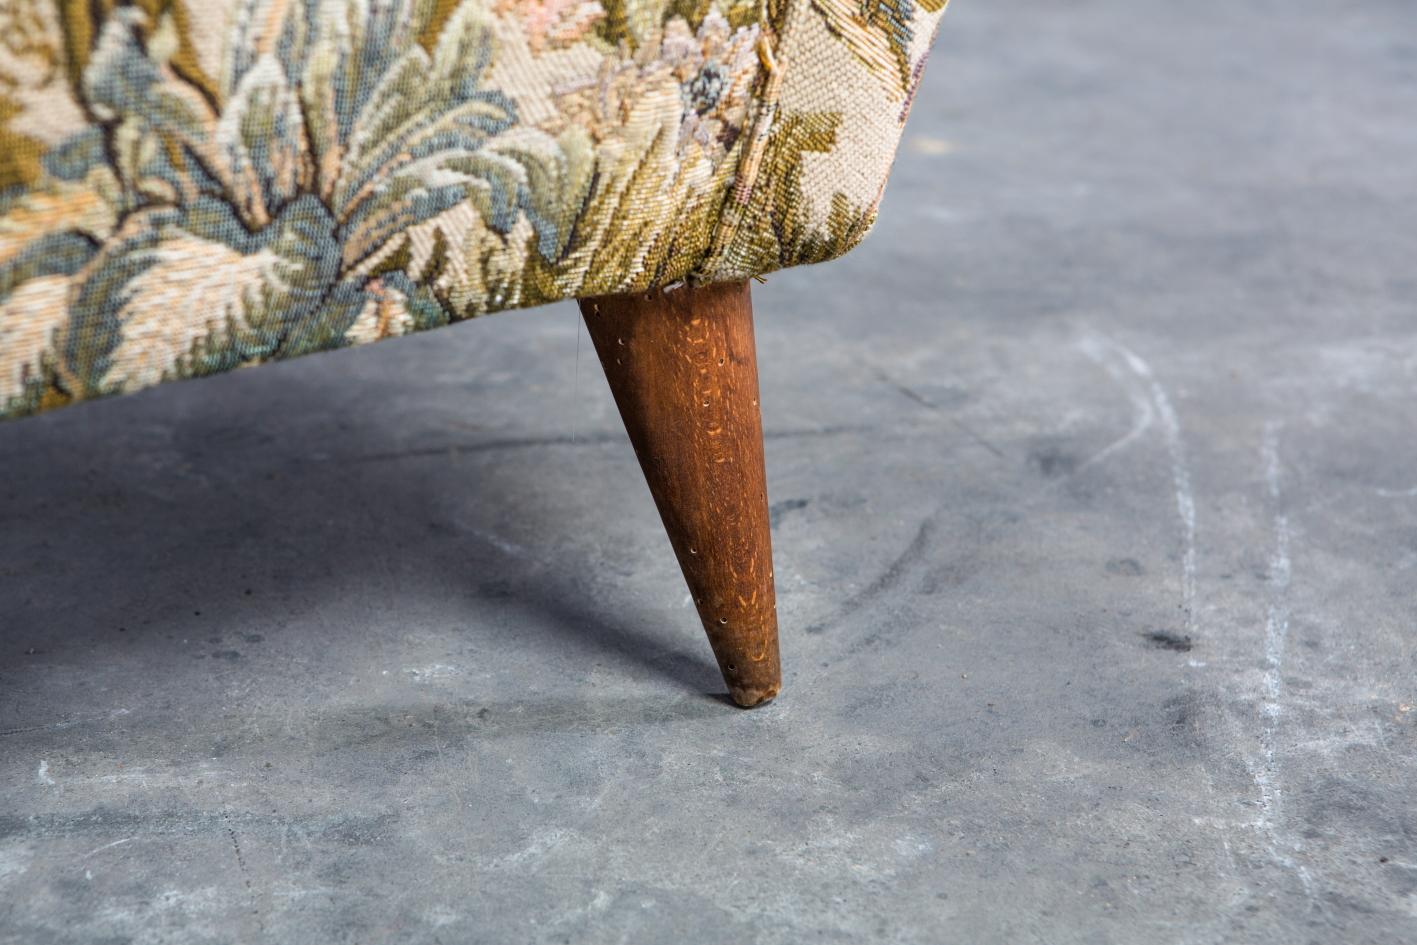 Armchairs Model 512 - Gio Ponti for Isa Bergamo - Foot detail